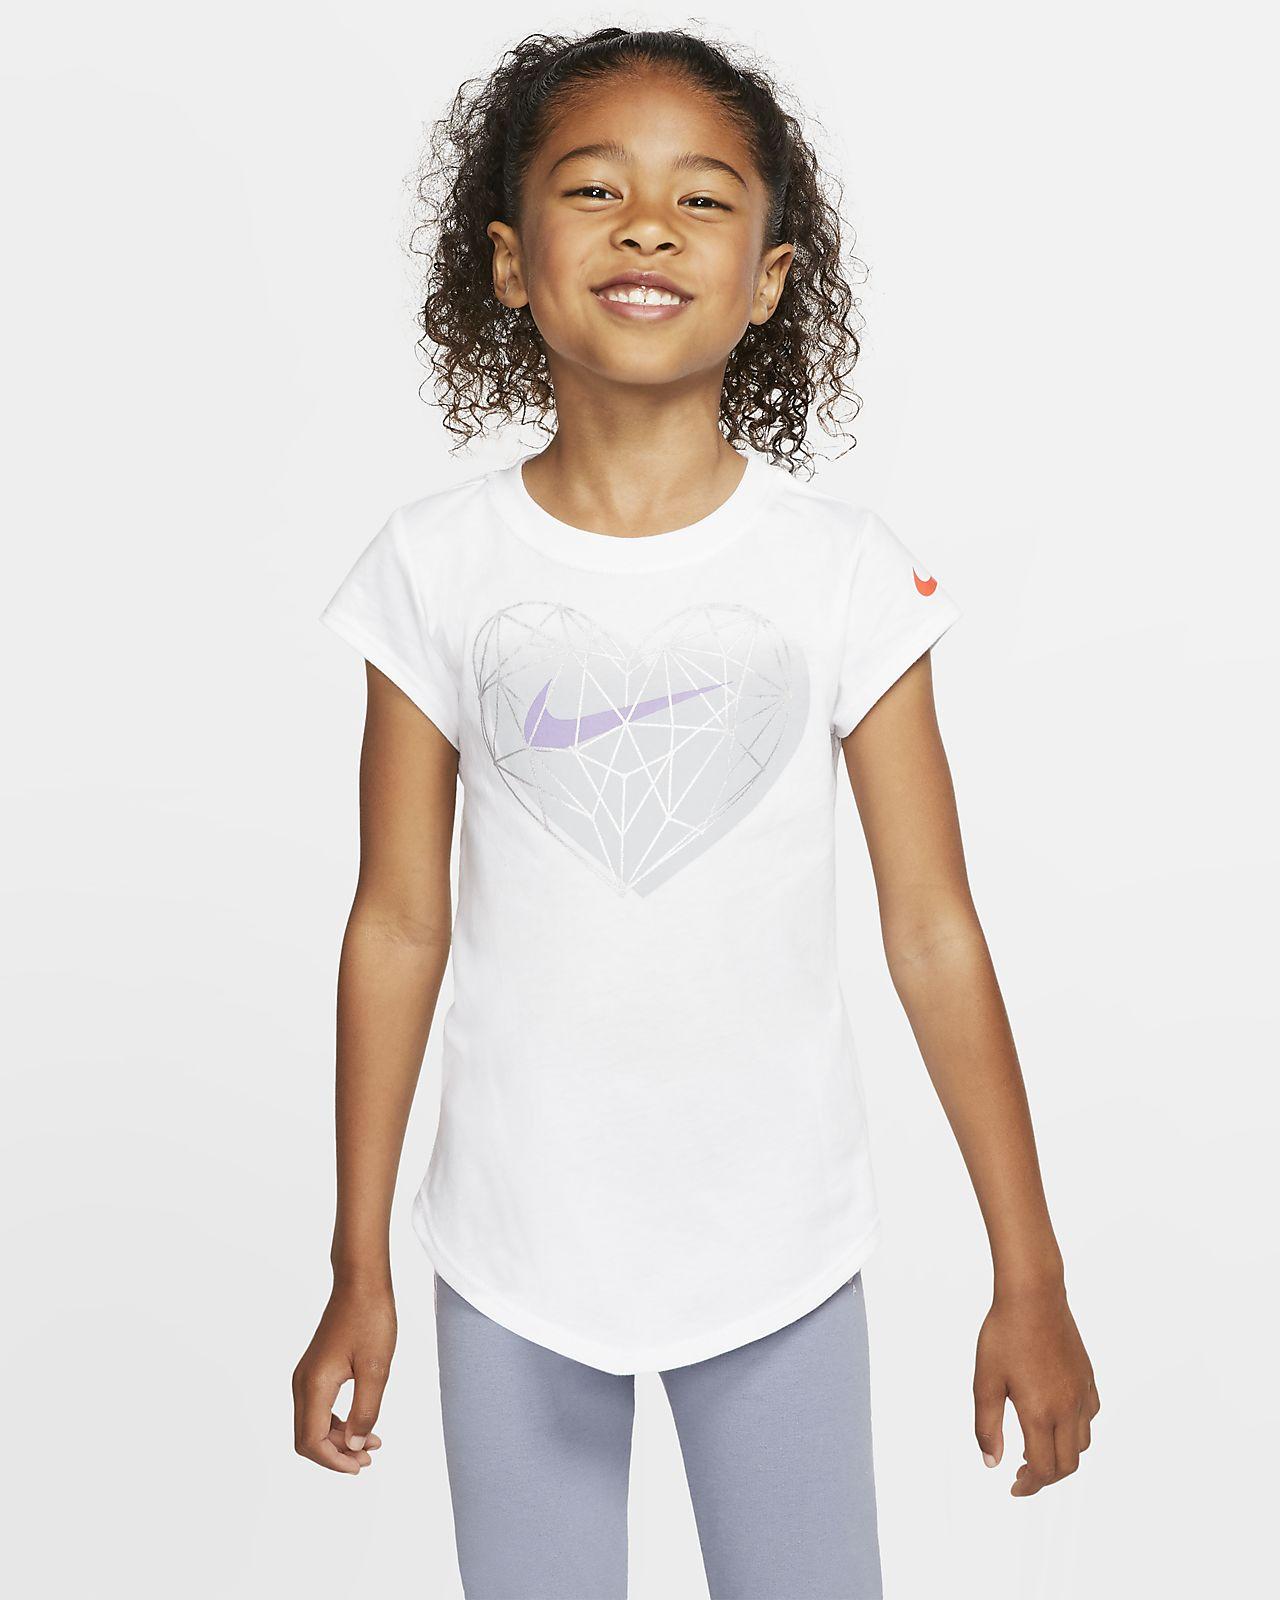 Nike 幼童短袖T恤